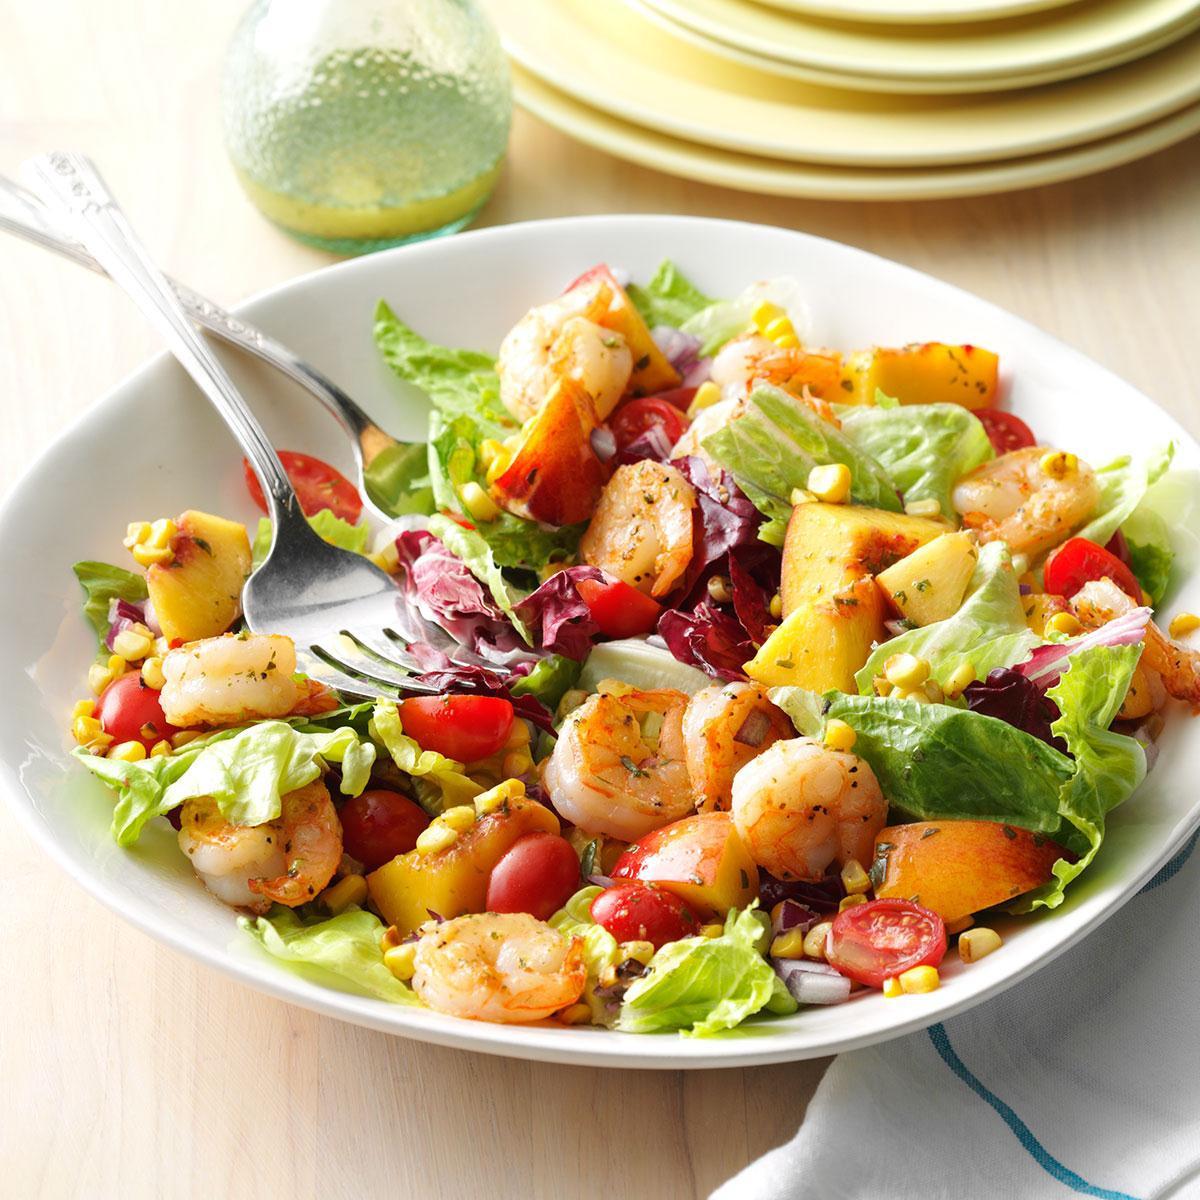 Summer Shrimp Salad  Shrimp & Nectarine Salad Recipe